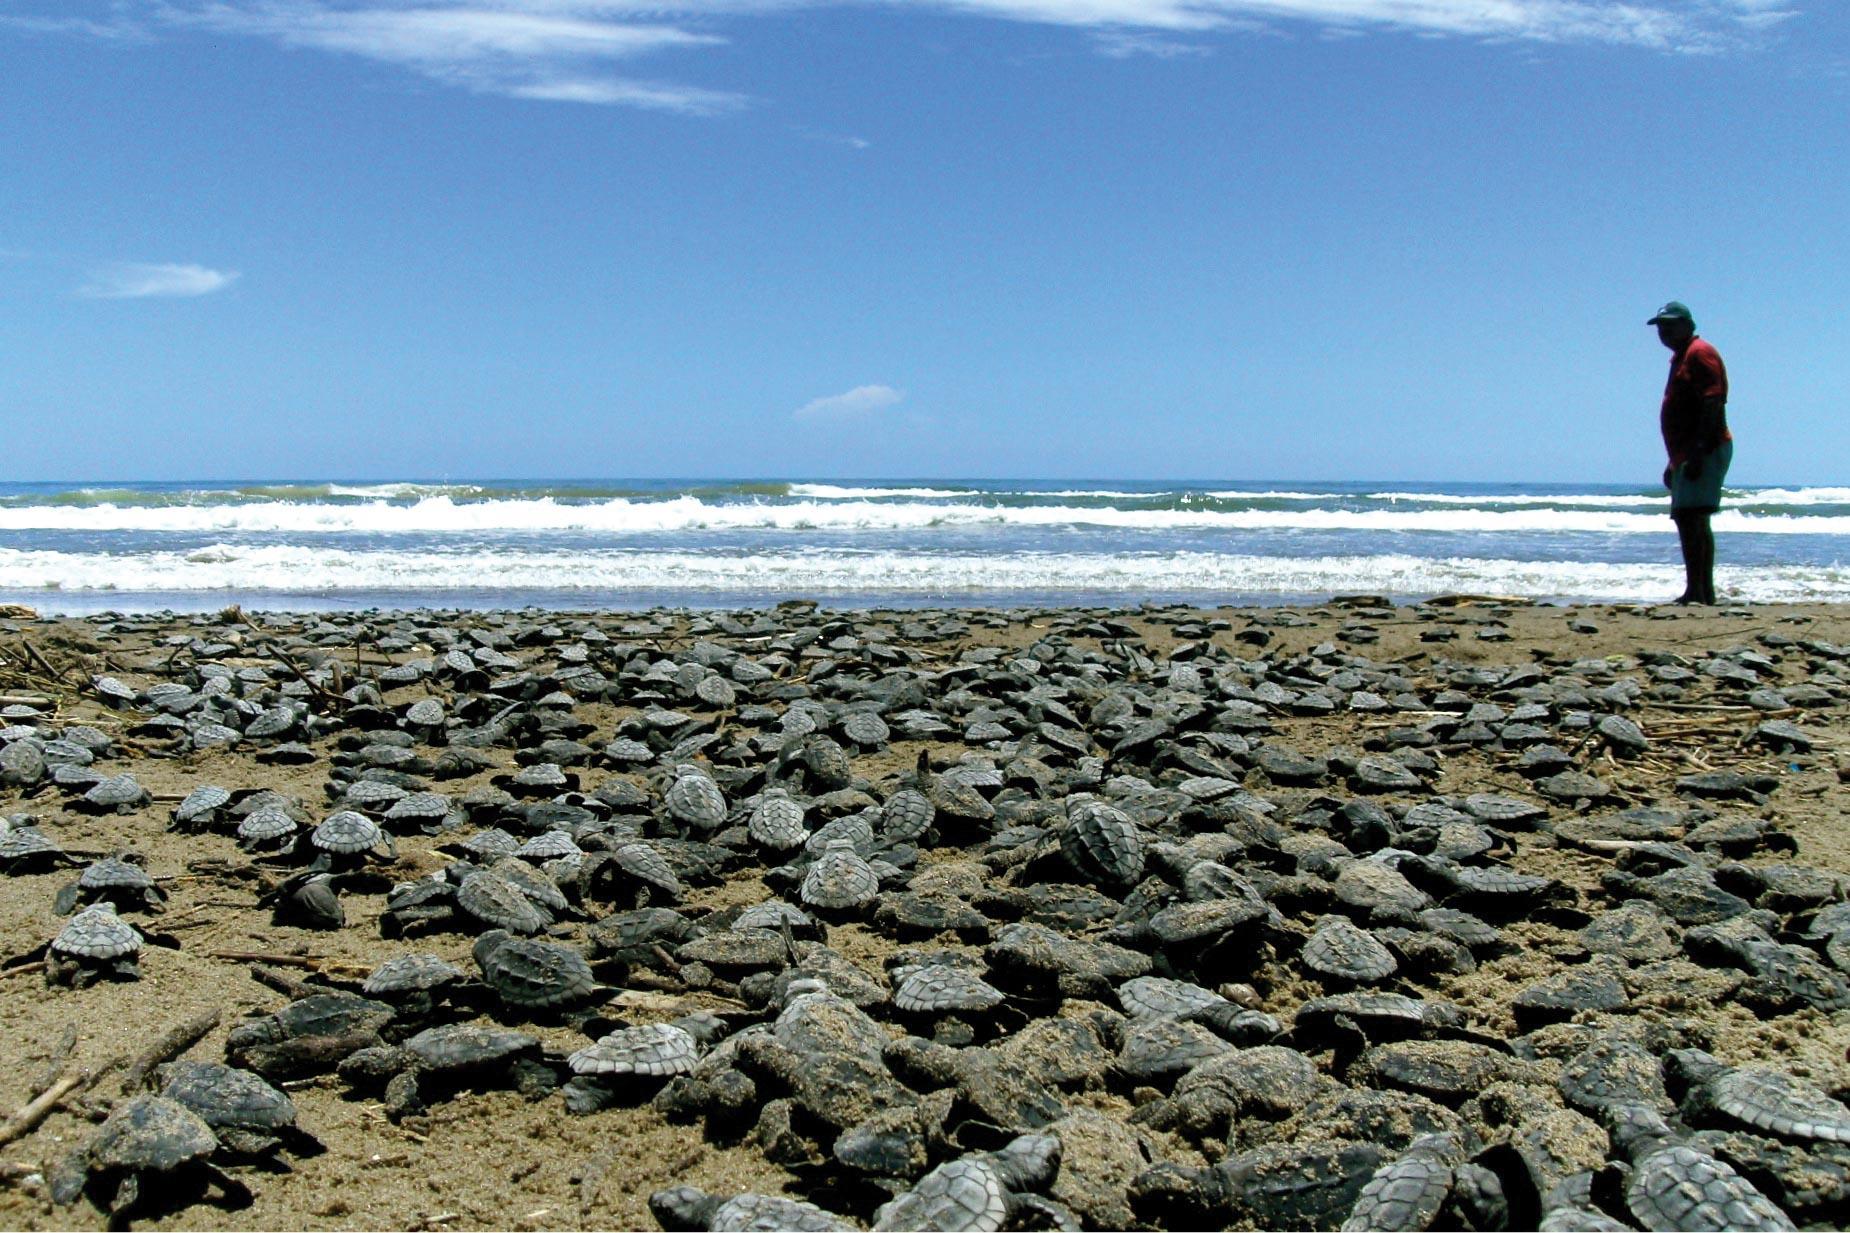 Kemp's ridley hatchings make their way to the sea in Tecolutla, Veracruz, Mexico. © Vida Milenari